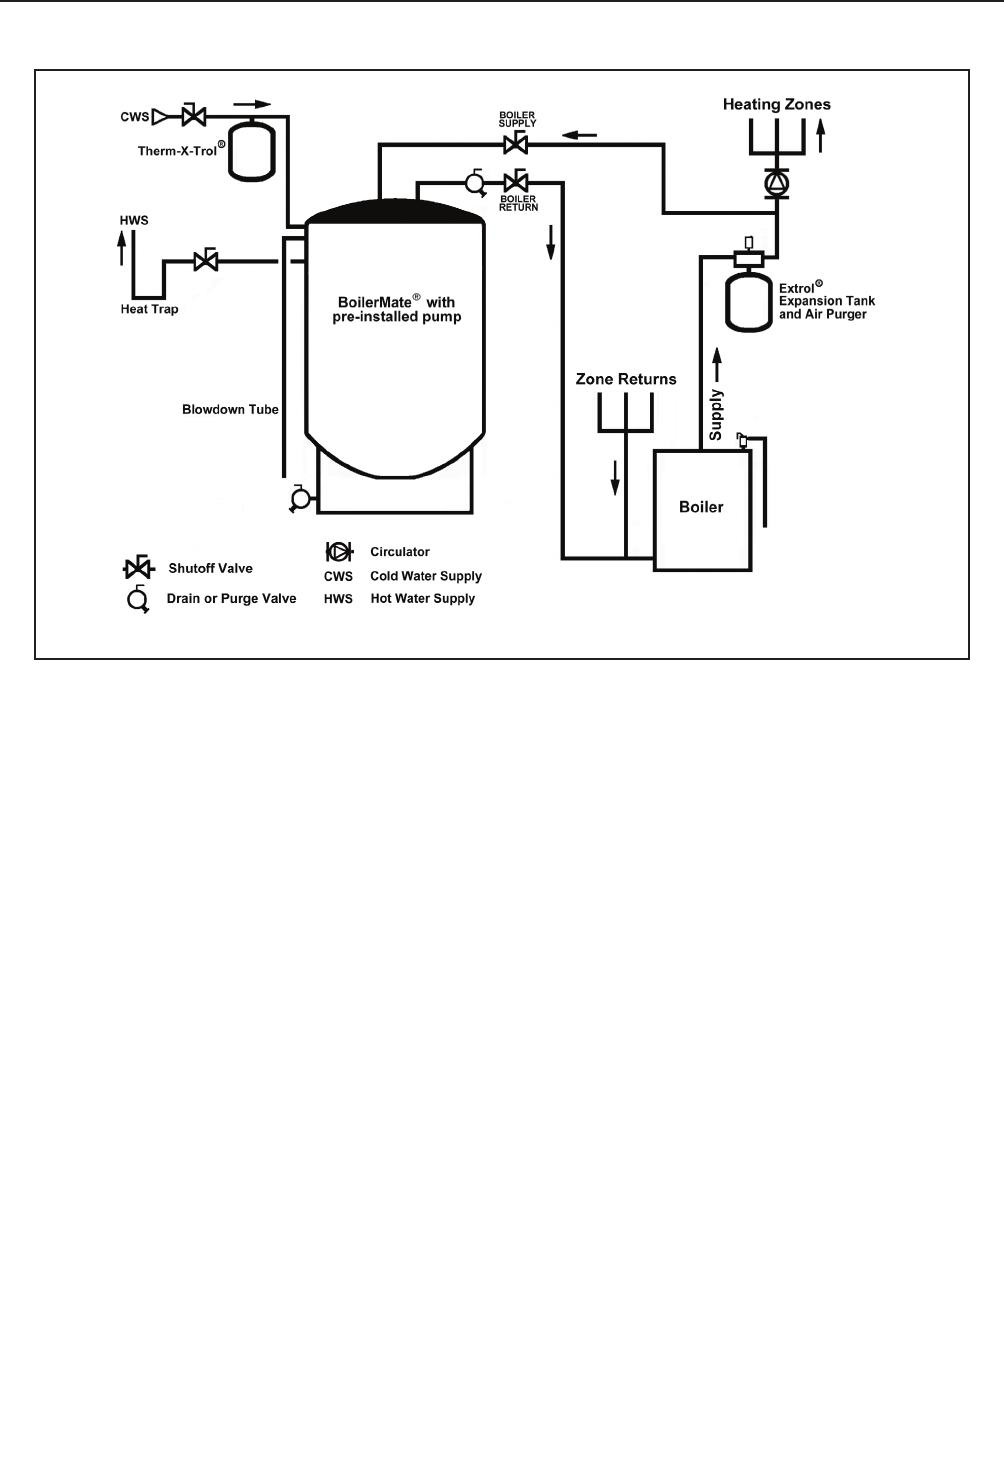 Amtrol Boilermate Rtr Installation Manual 9040 586 07_08 Indirect IOUserManual.wiki